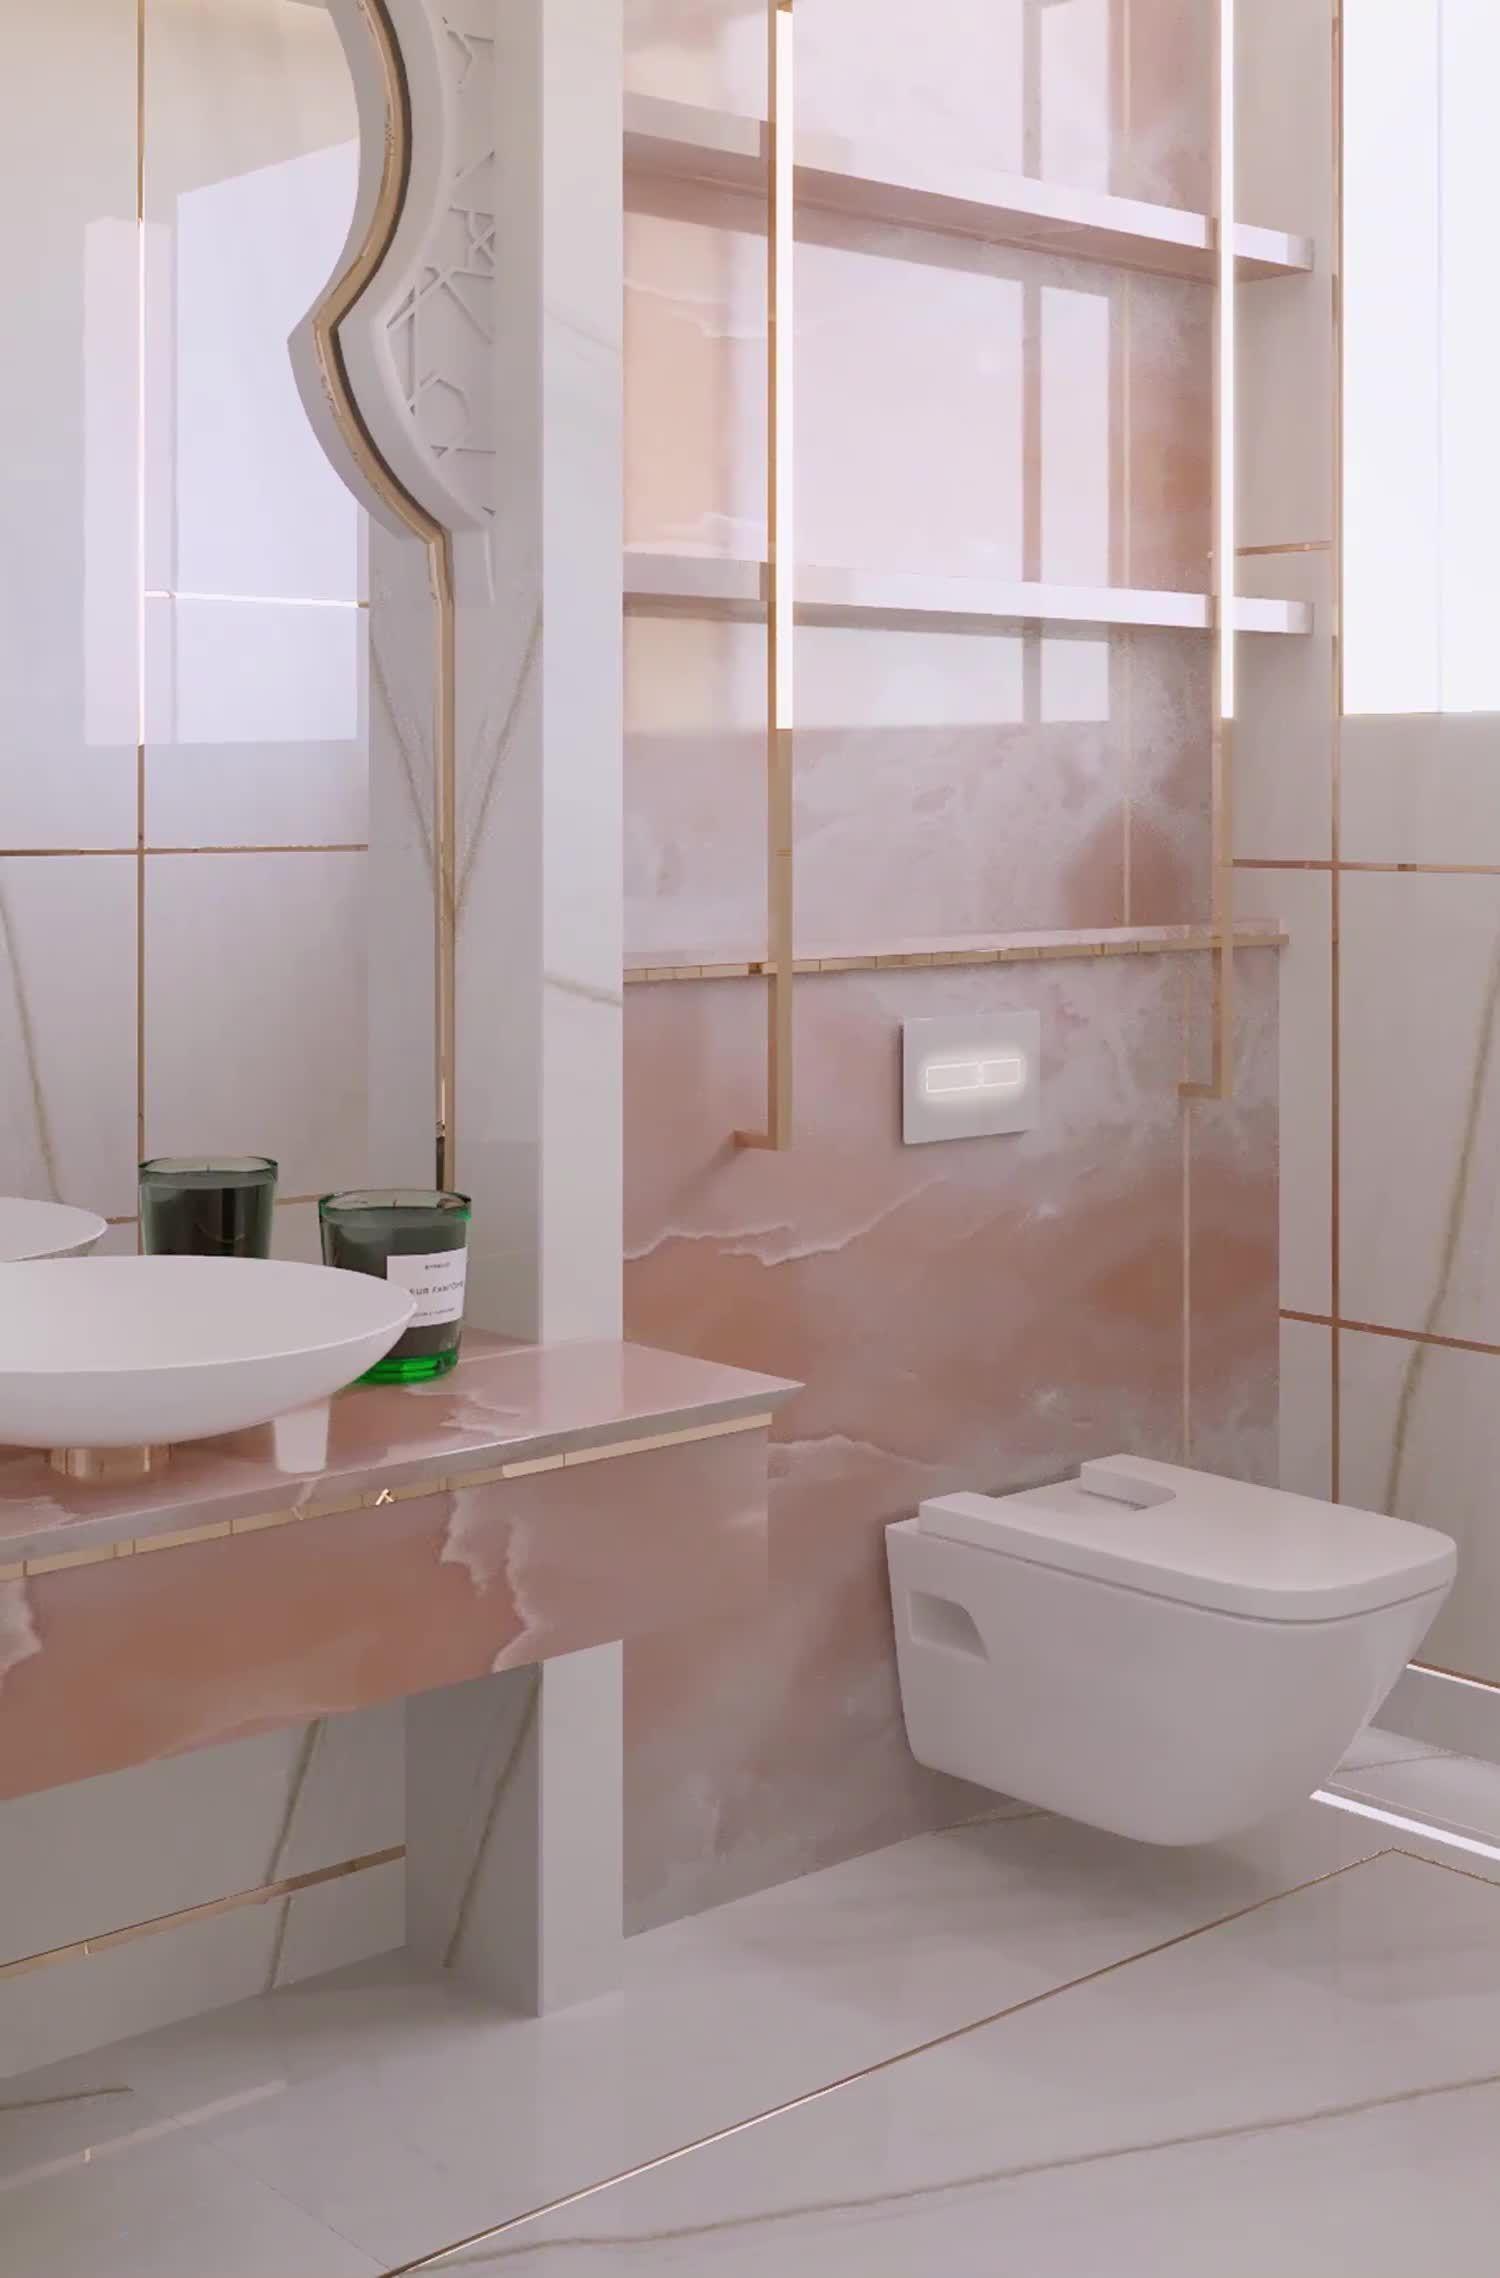 Elegant Bathroom Interior Design Videos By Designers Of Spazio In 2021 Bathroom Interior Design Modern Bathroom Interior Design Bathroom Design Decor